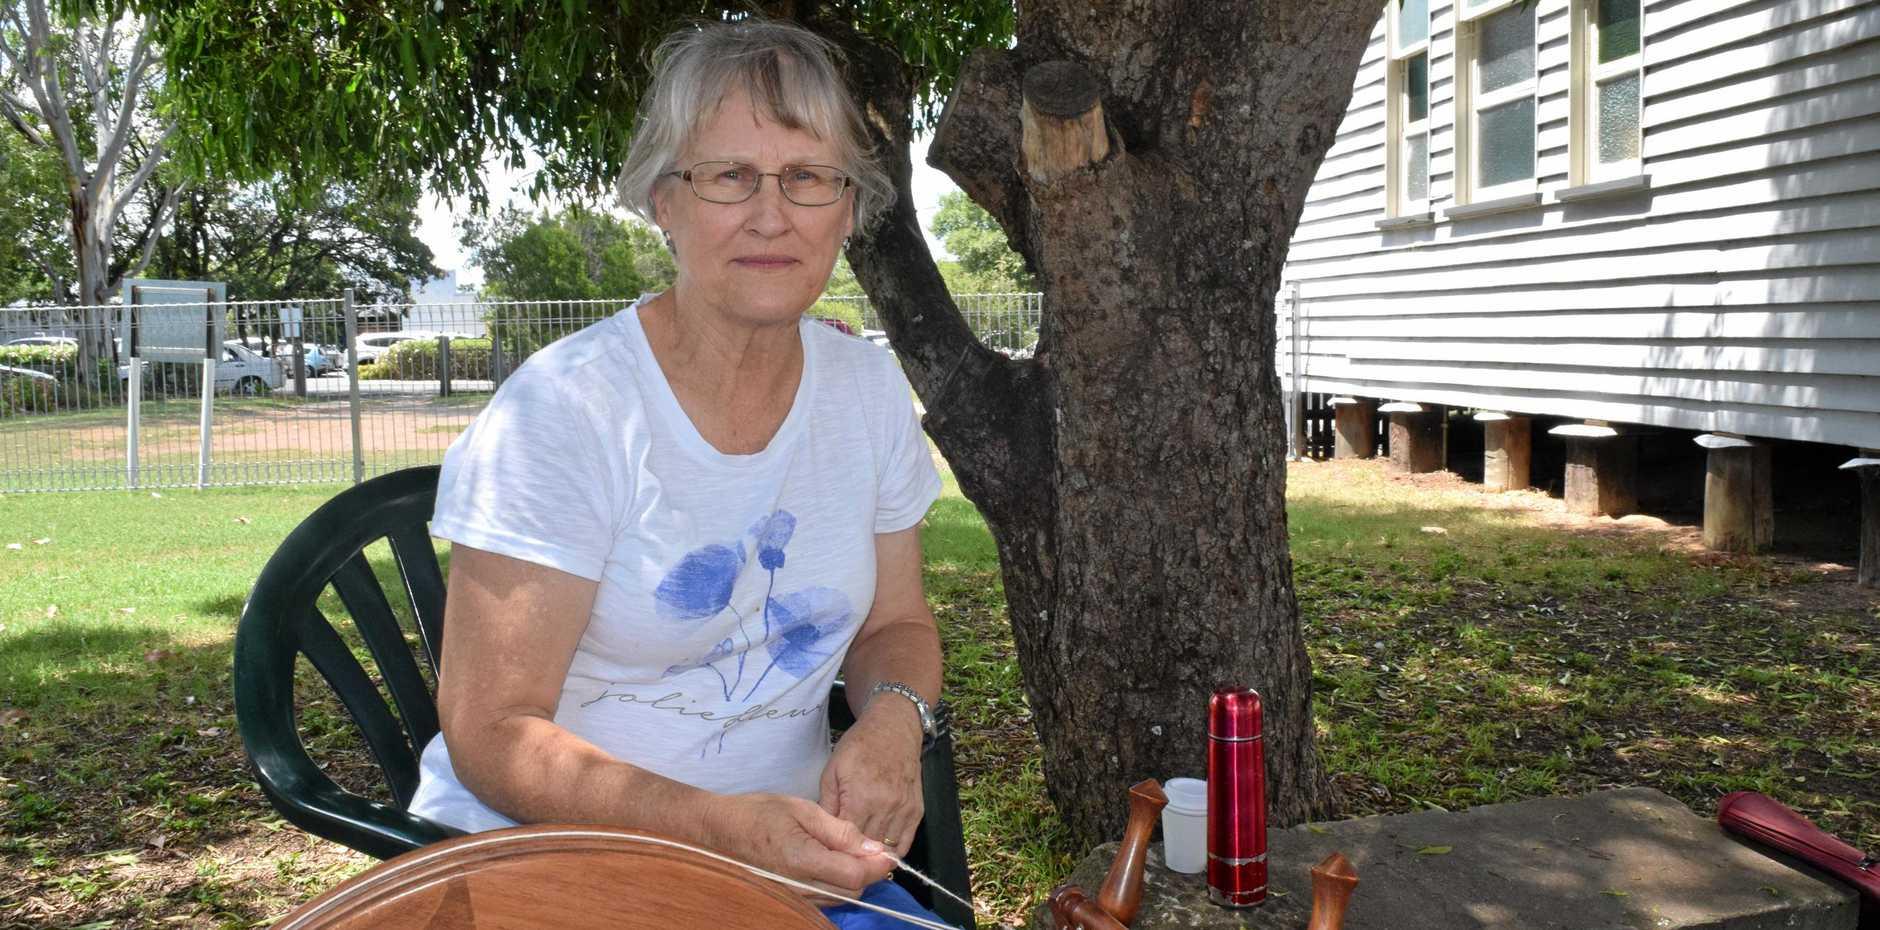 CANADIAN EXPAT: Janice Flood spins a yarn.